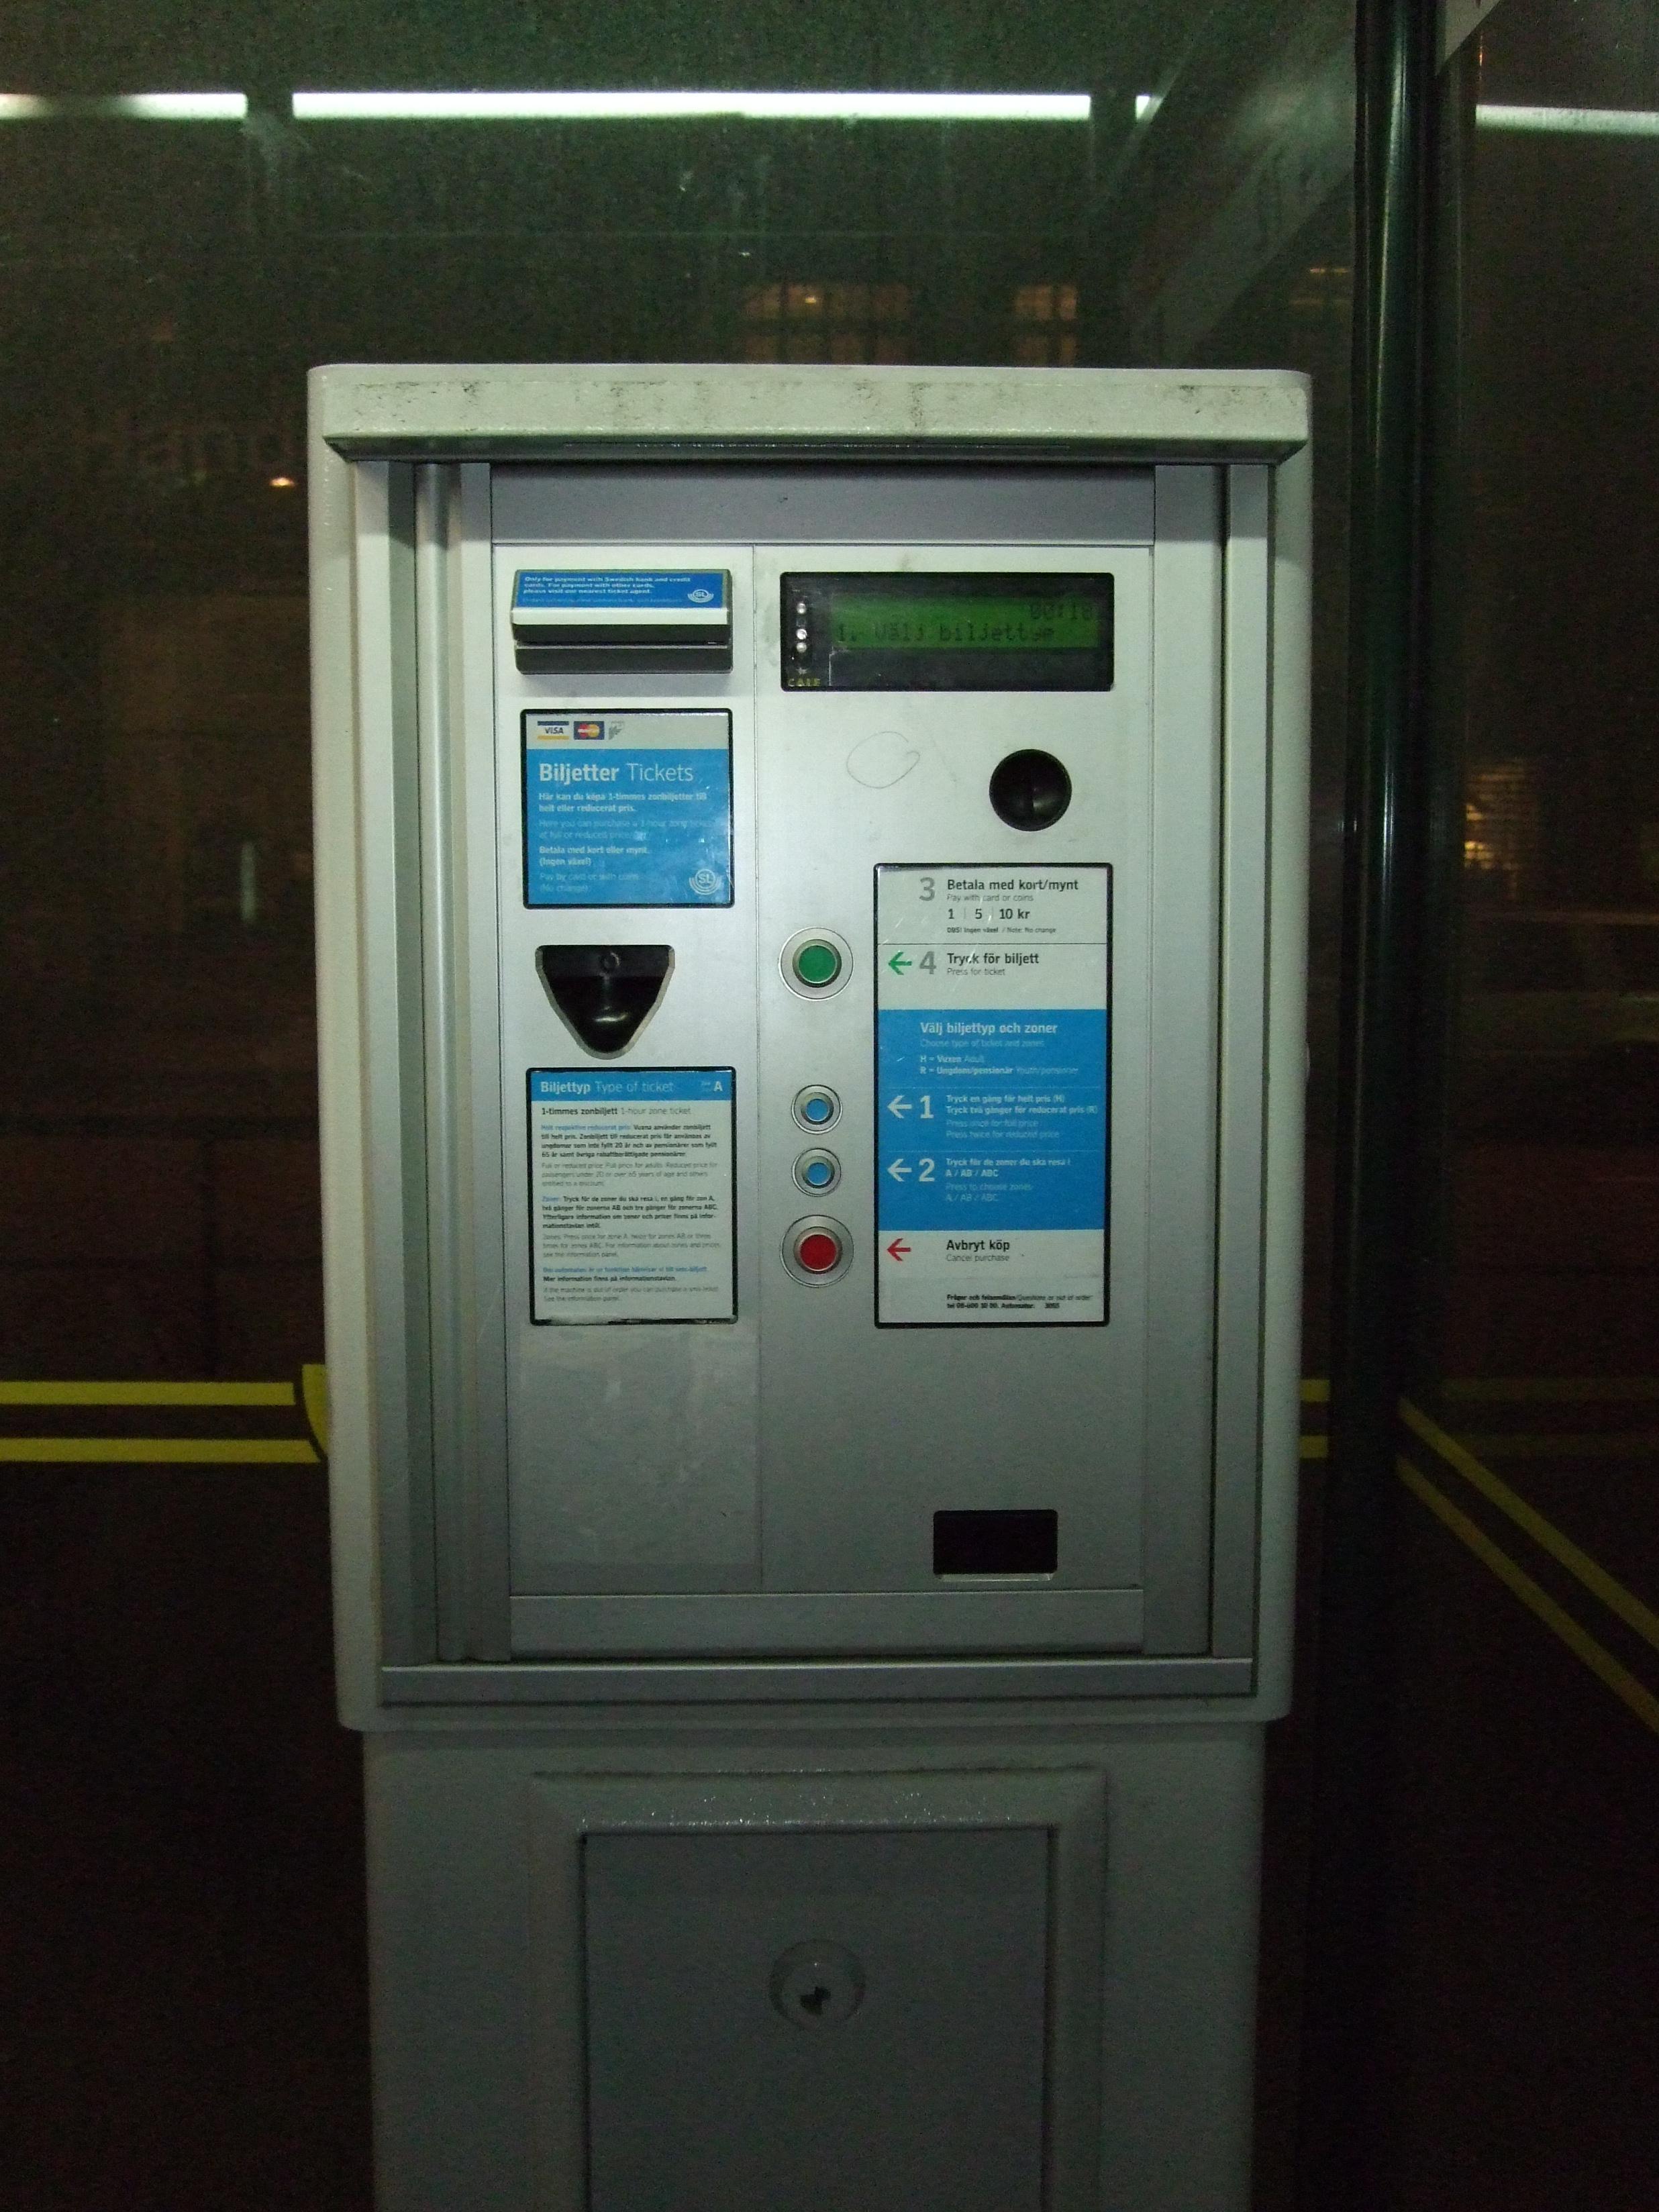 Flygbussarna's ticket desk in Cityterminalen